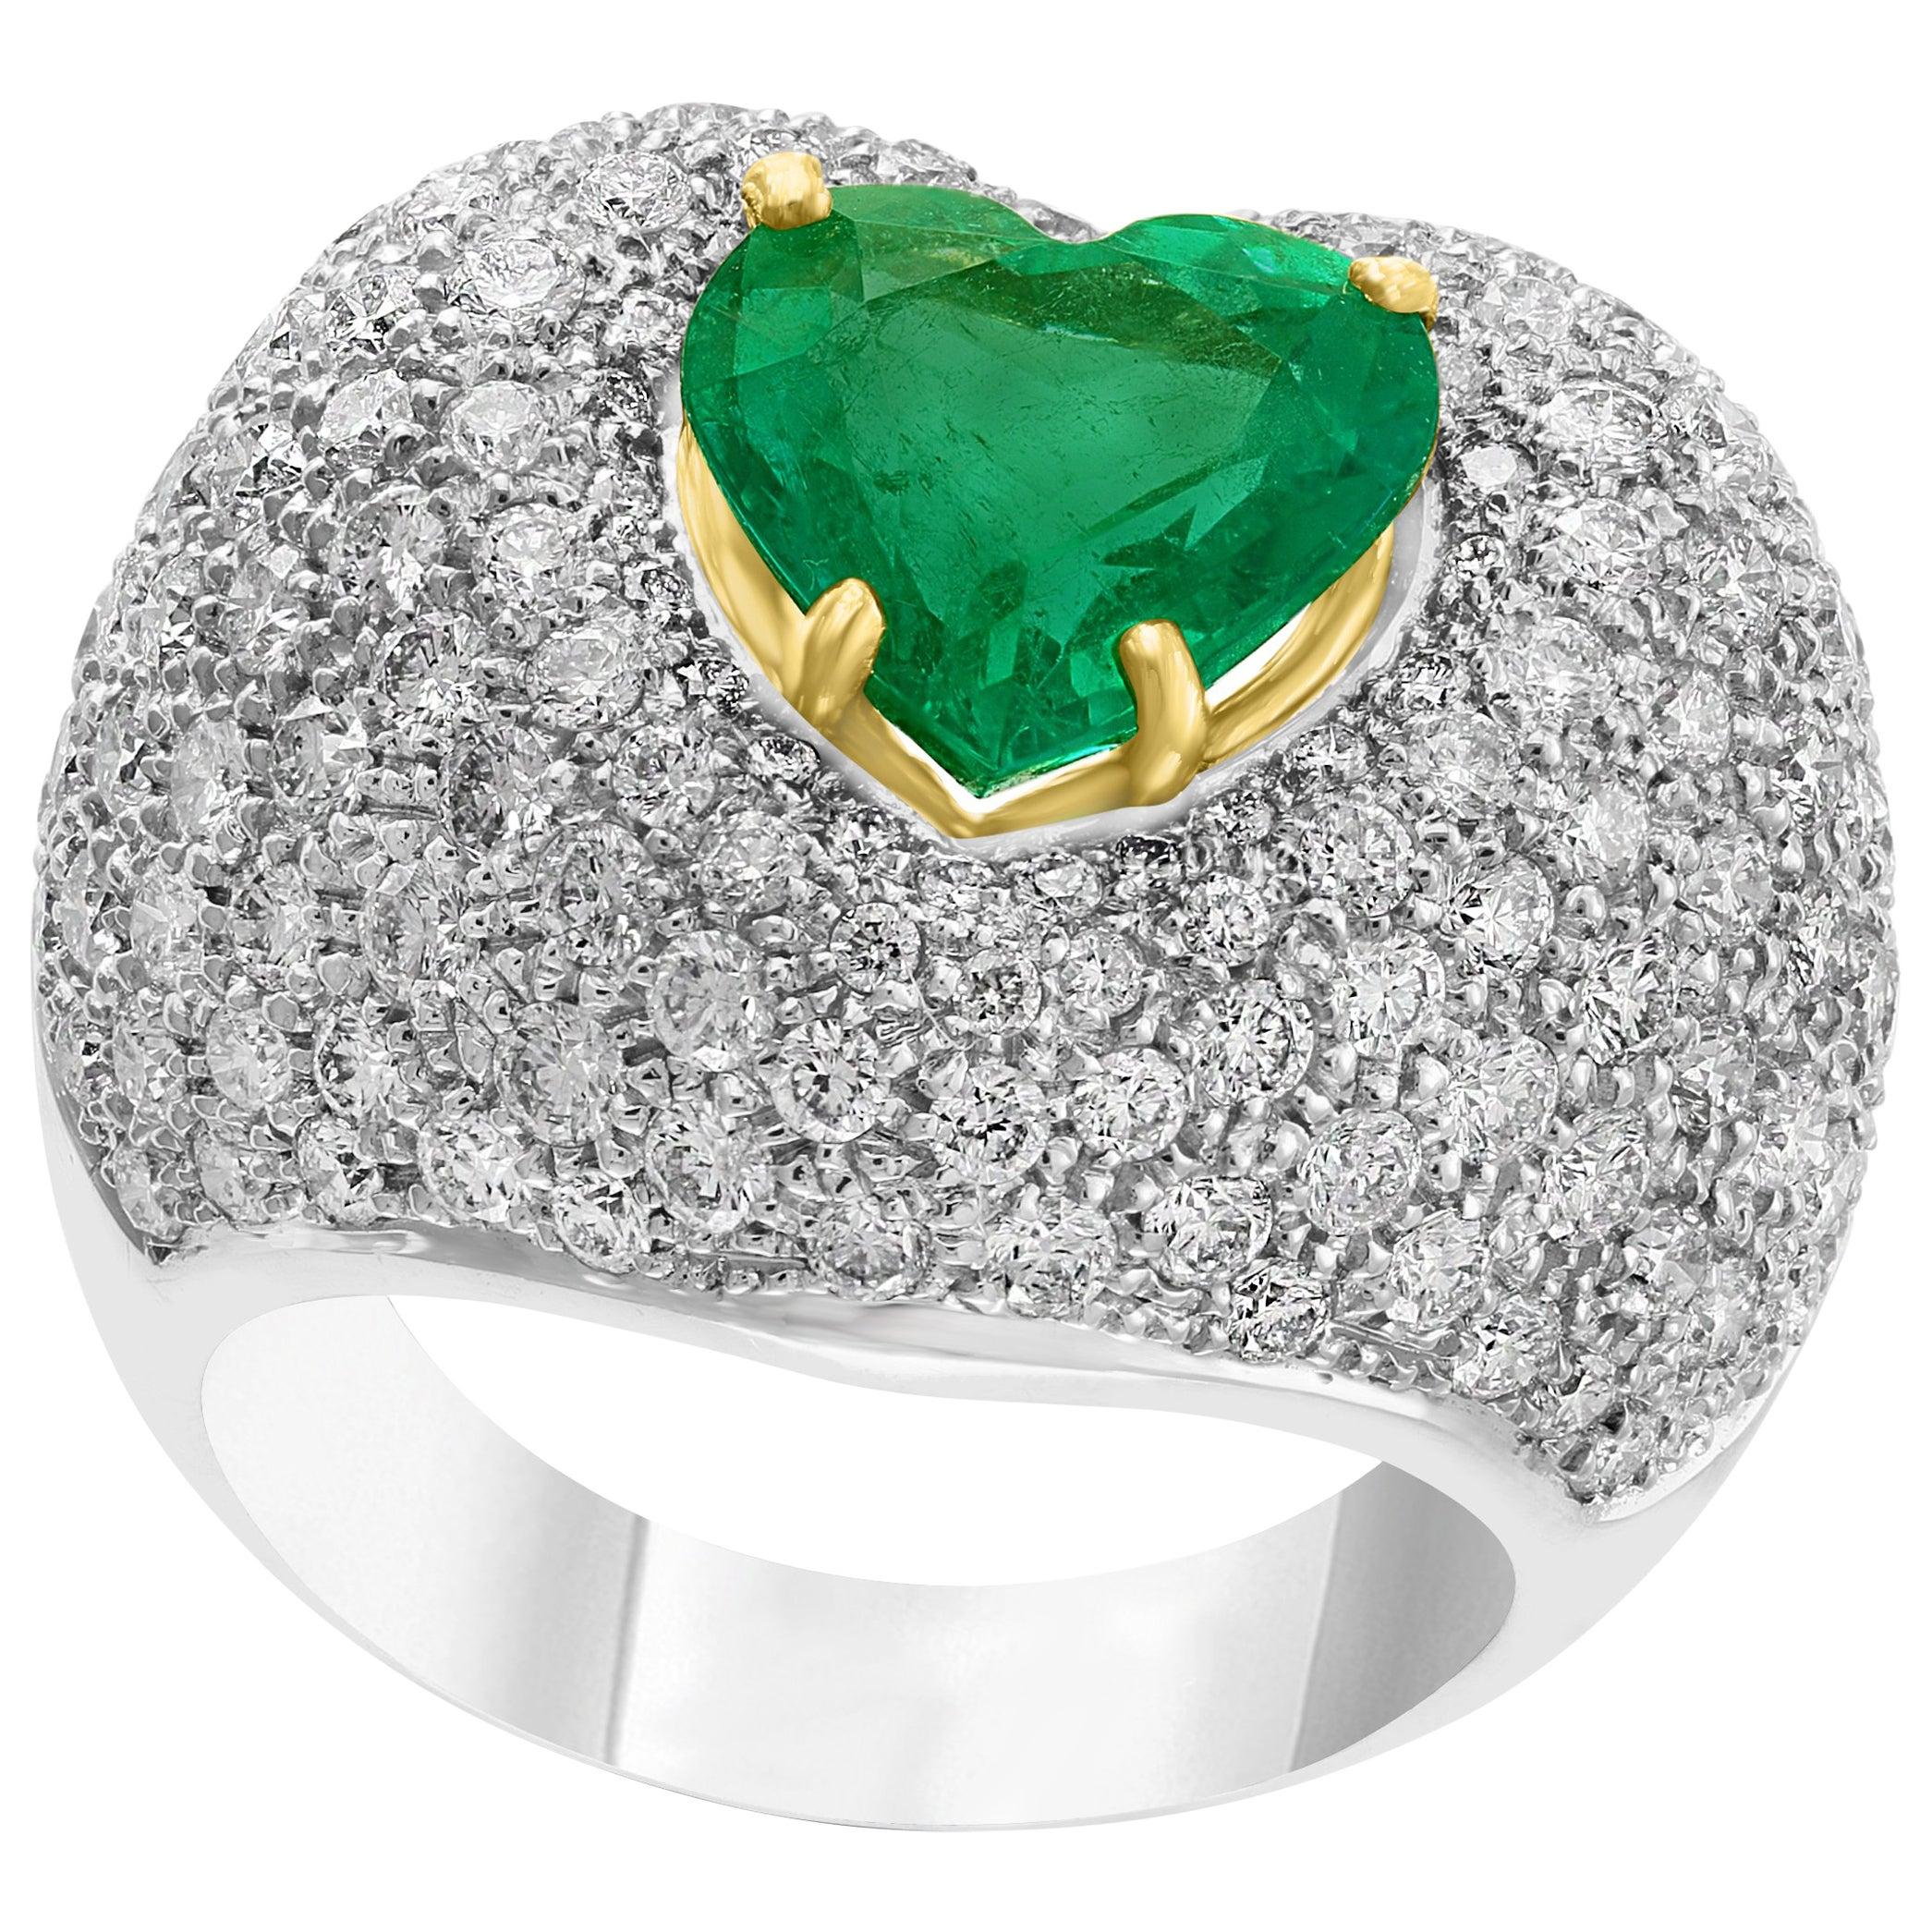 3.5 Carat Heart Shape Colombian Emerald and Diamond 18 Karat Gold Ring Estate